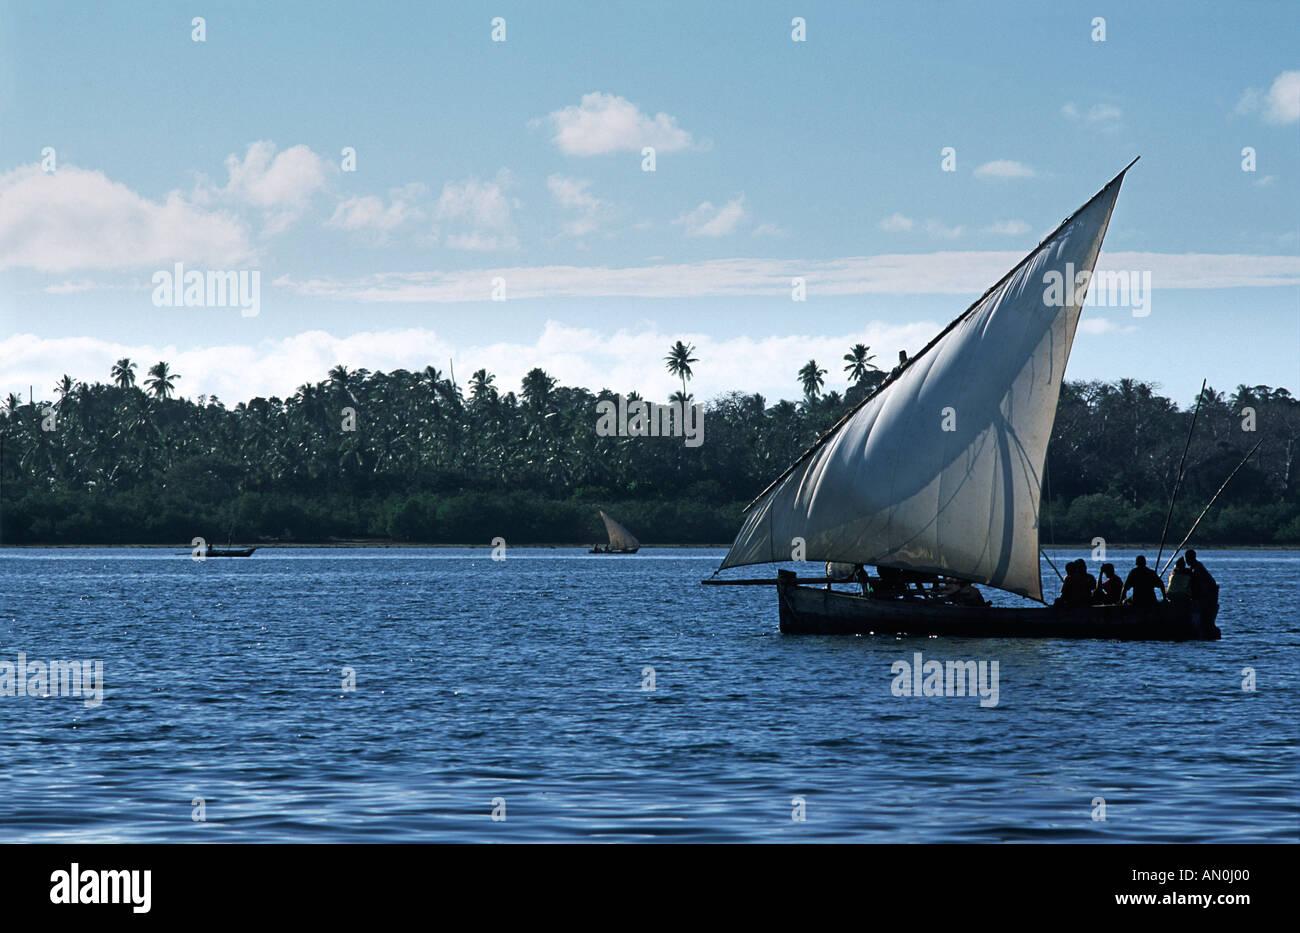 Traditional dhow operating as a local passenger ferry between Mafia island and Chole island south of Zanzibar Tanzania E Africa - Stock Image